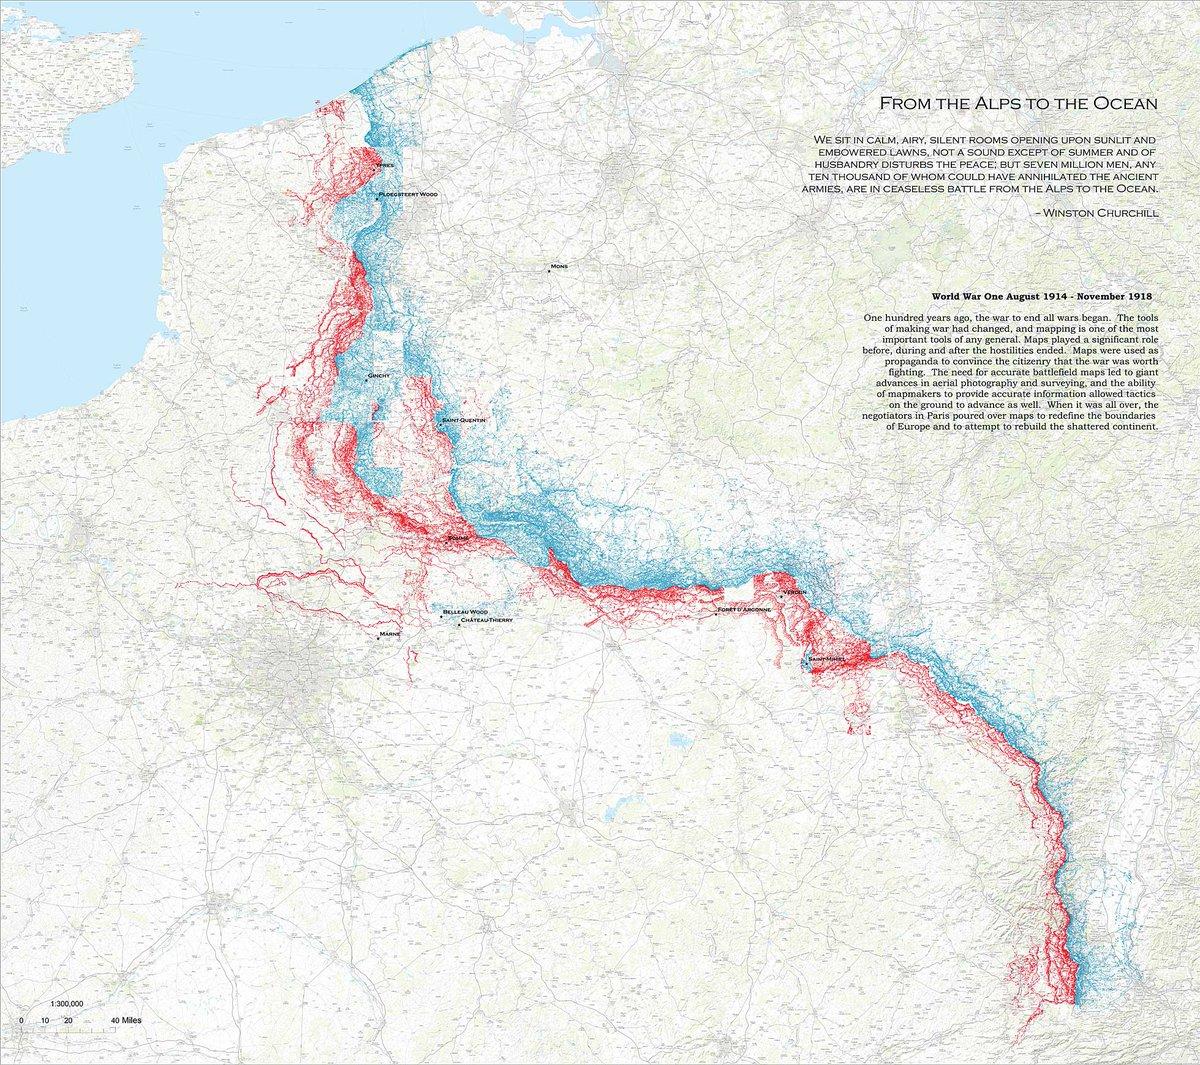 Brilliant Maps on Twitter: \